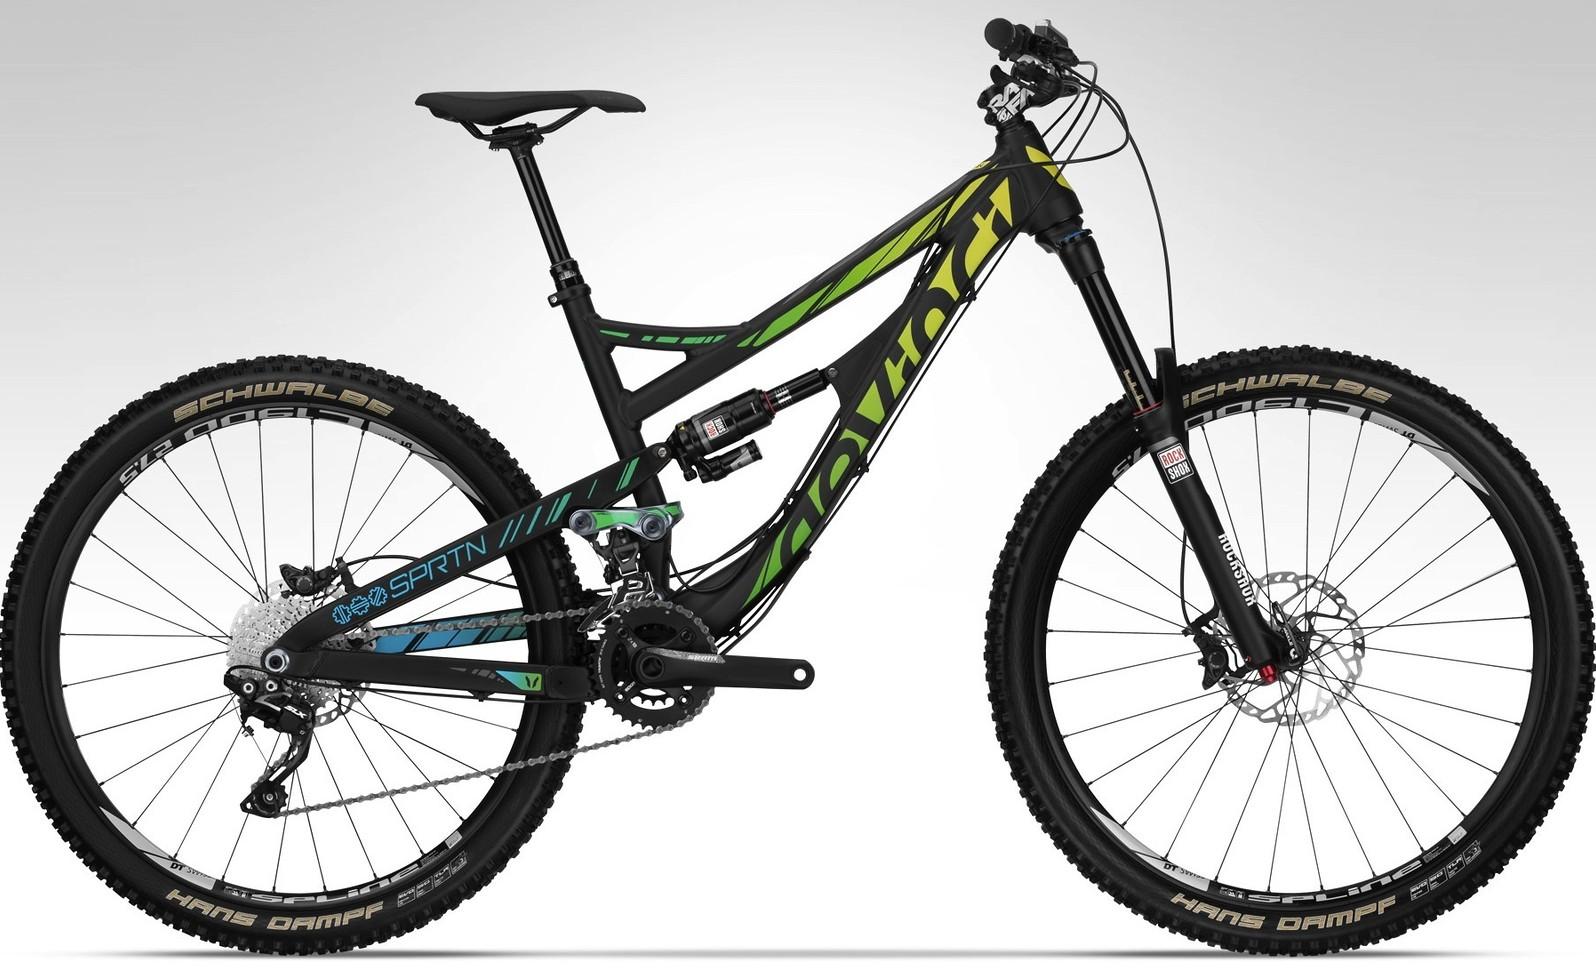 Devinci SPARTAN RC bike